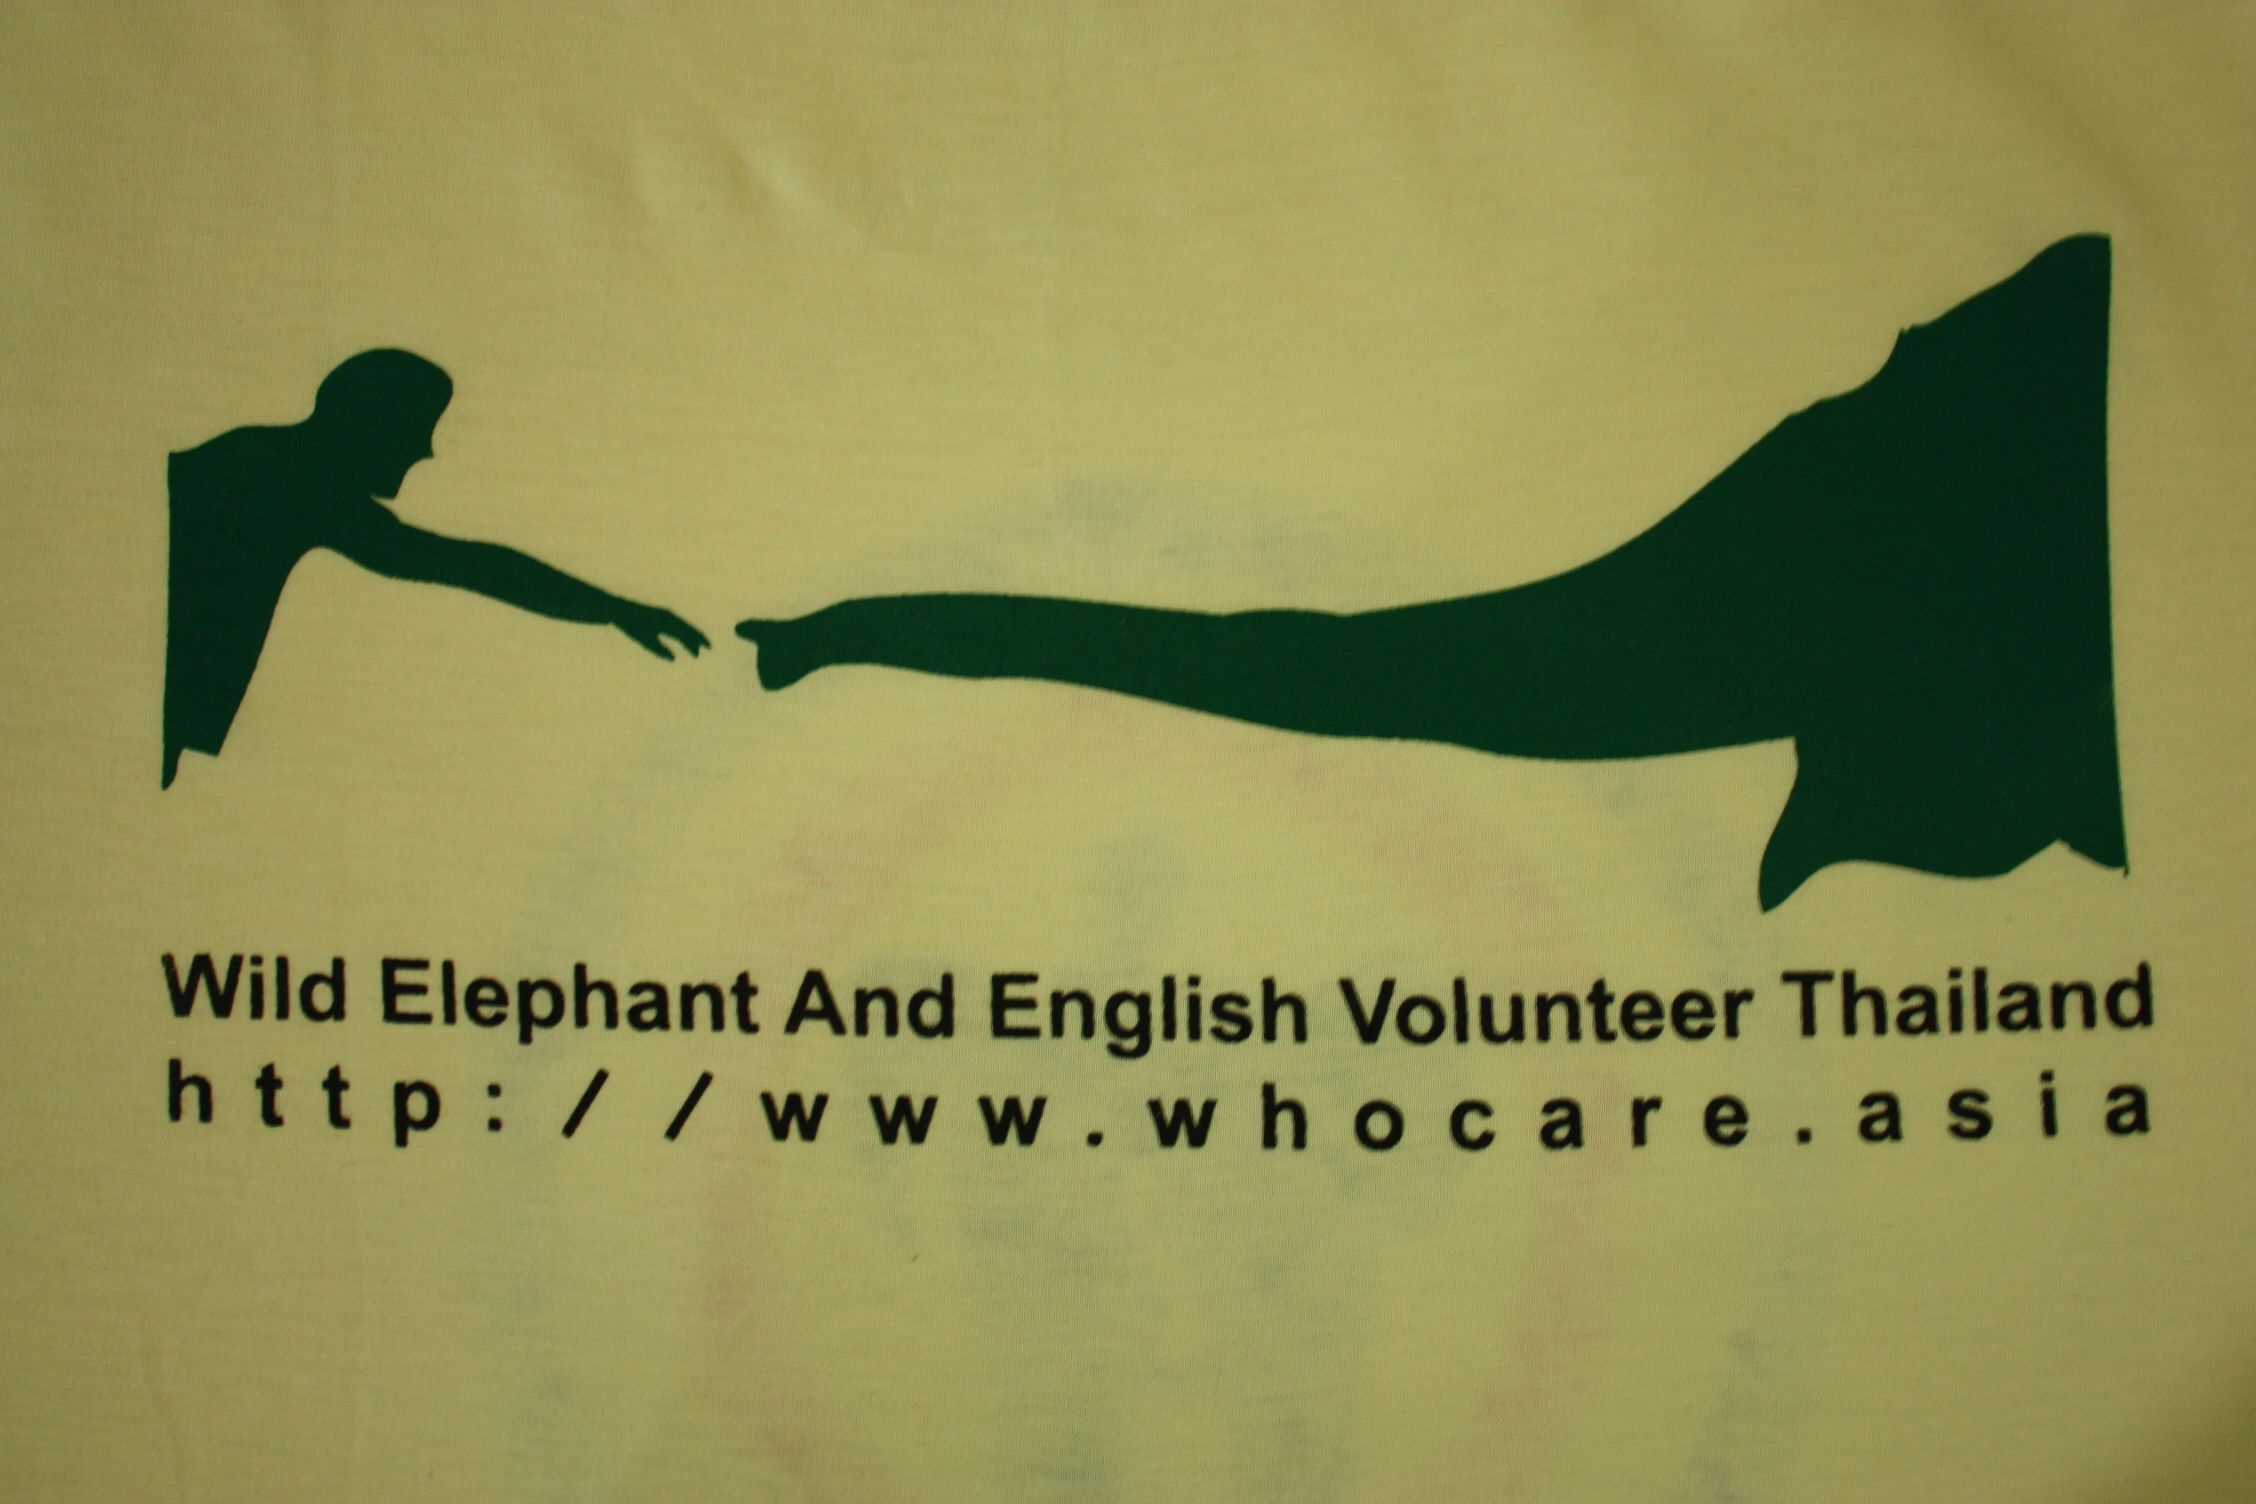 whocare T shirt design